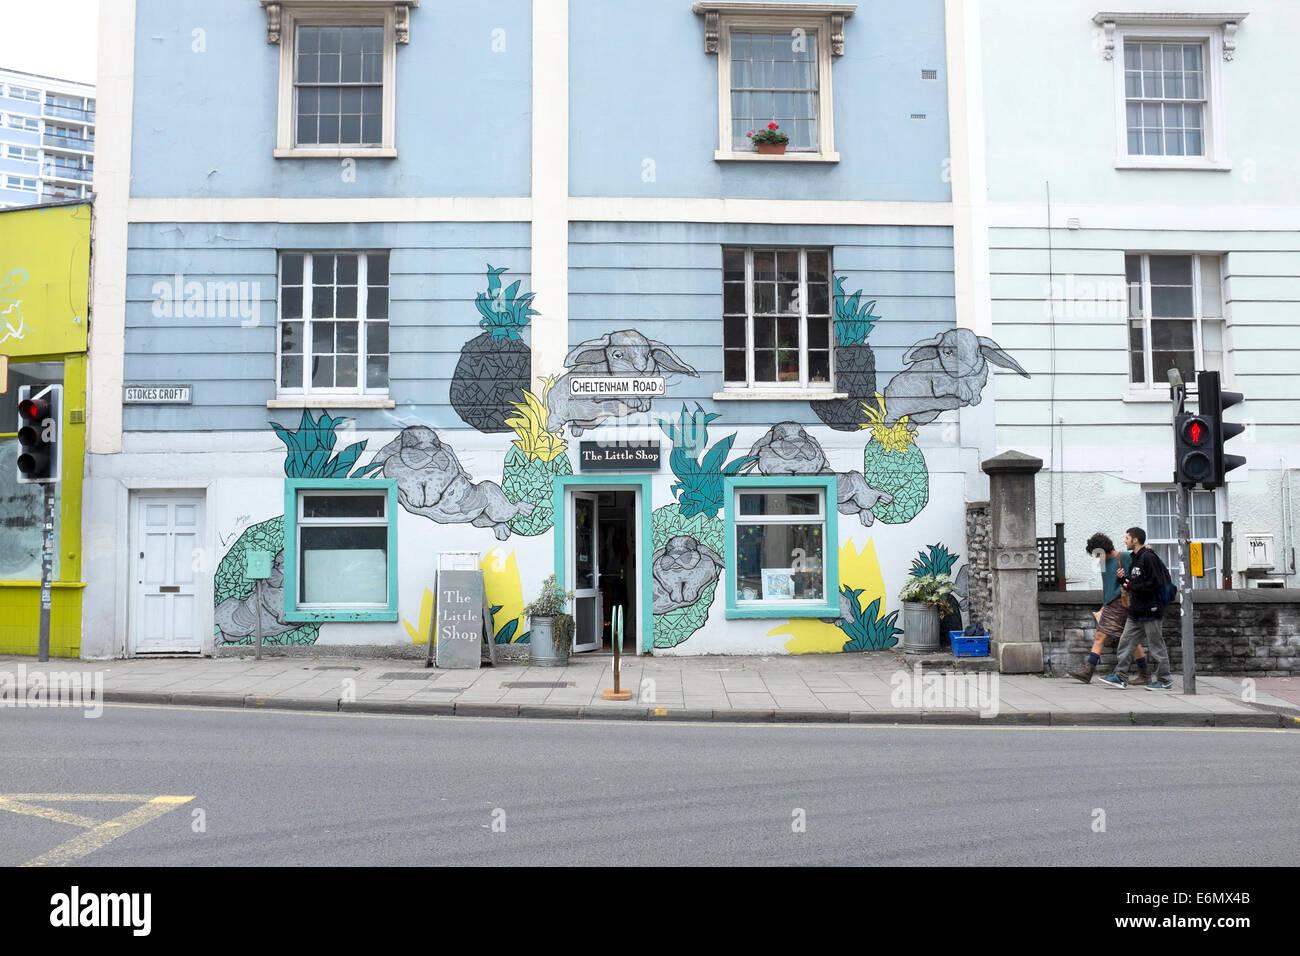 The Little Shop Cheltenham Road Stokes Croft Bristol - Stock Image